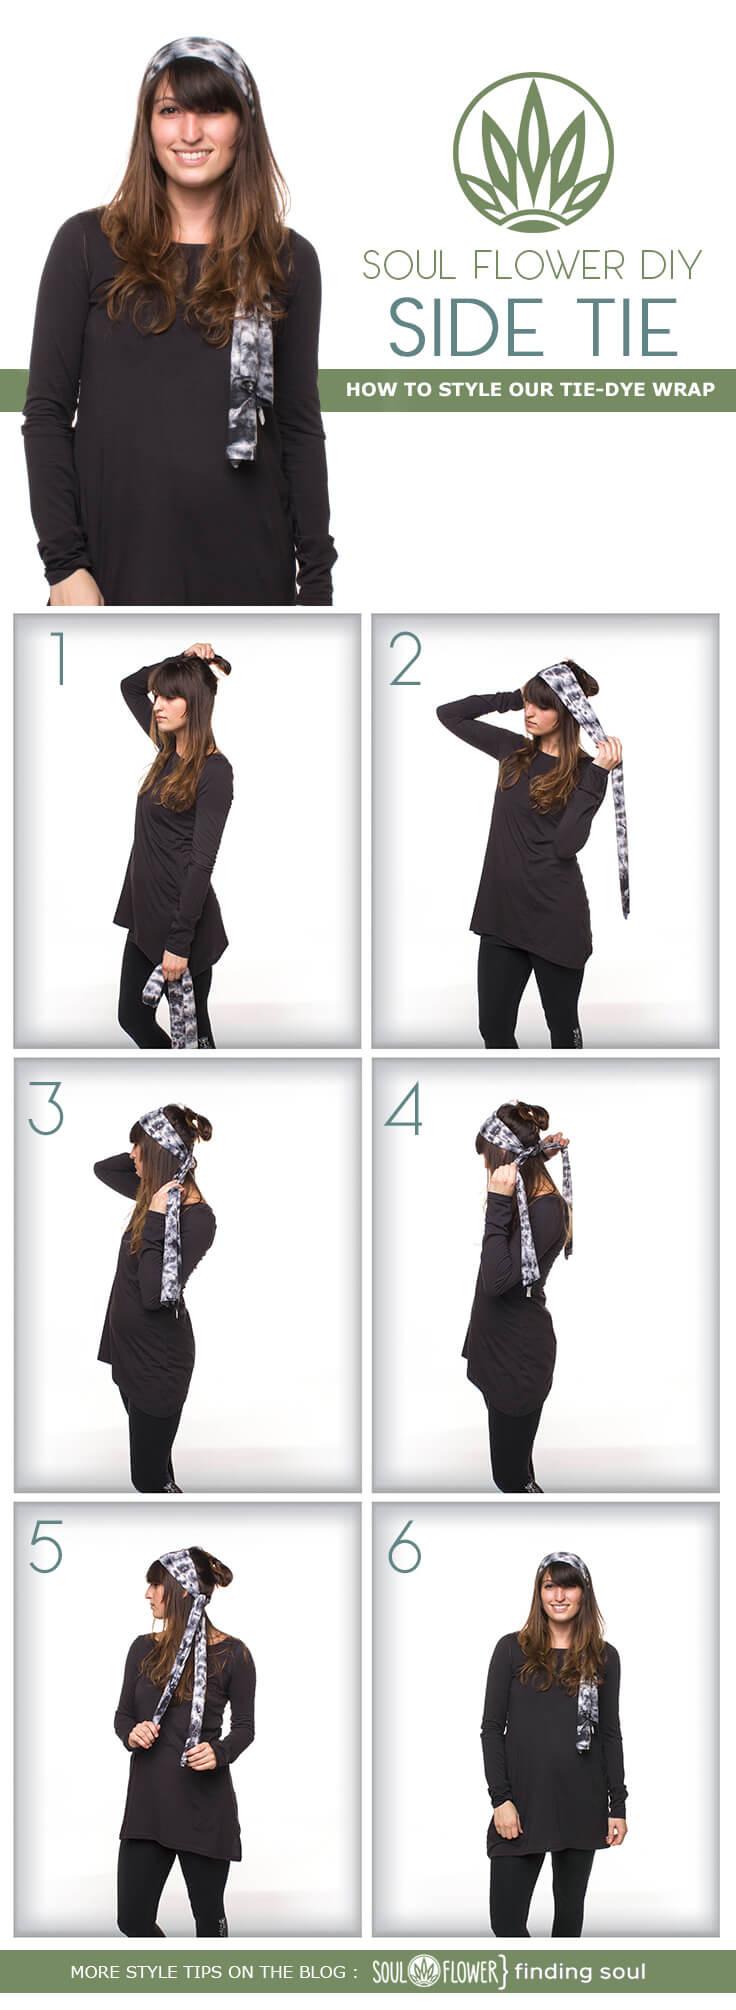 Side tie - 6 Ways to Style Our Tie-Dye Wrap